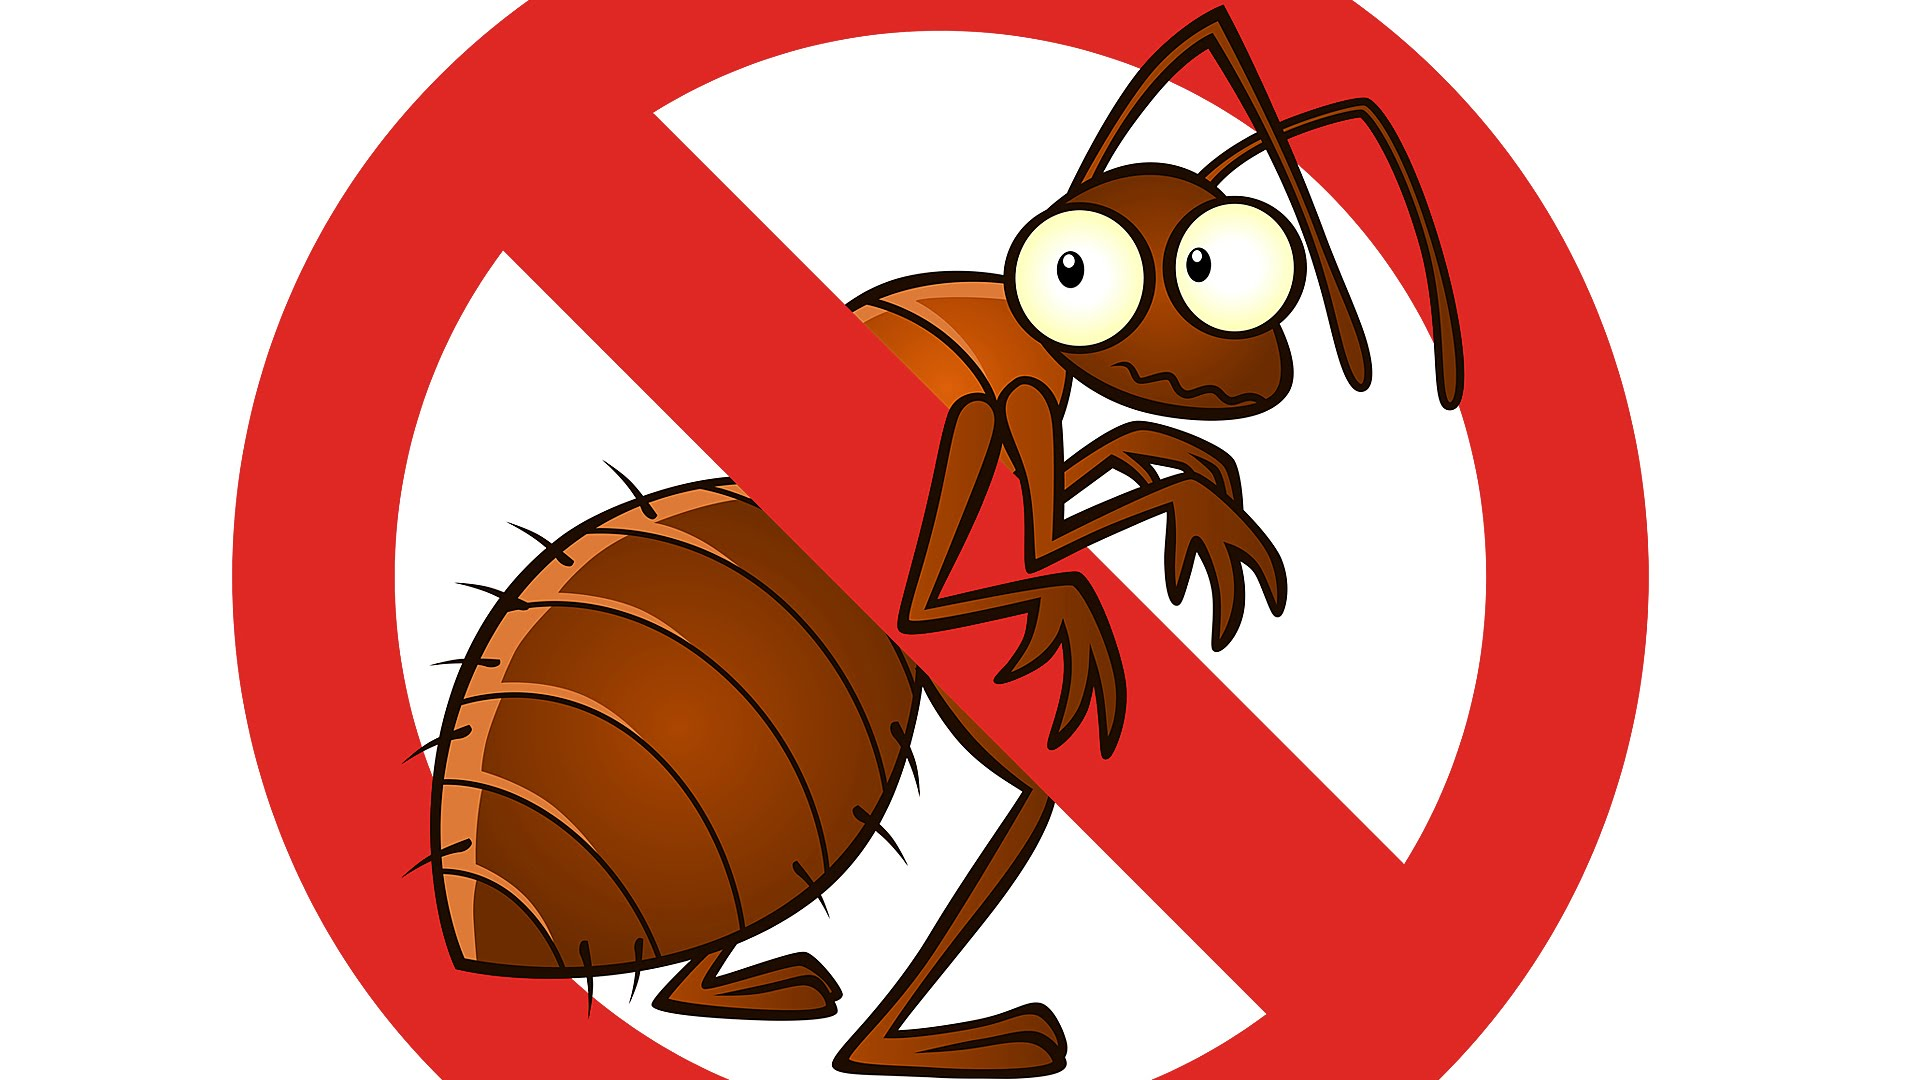 картинки борьбы с тараканами недавно диковинку